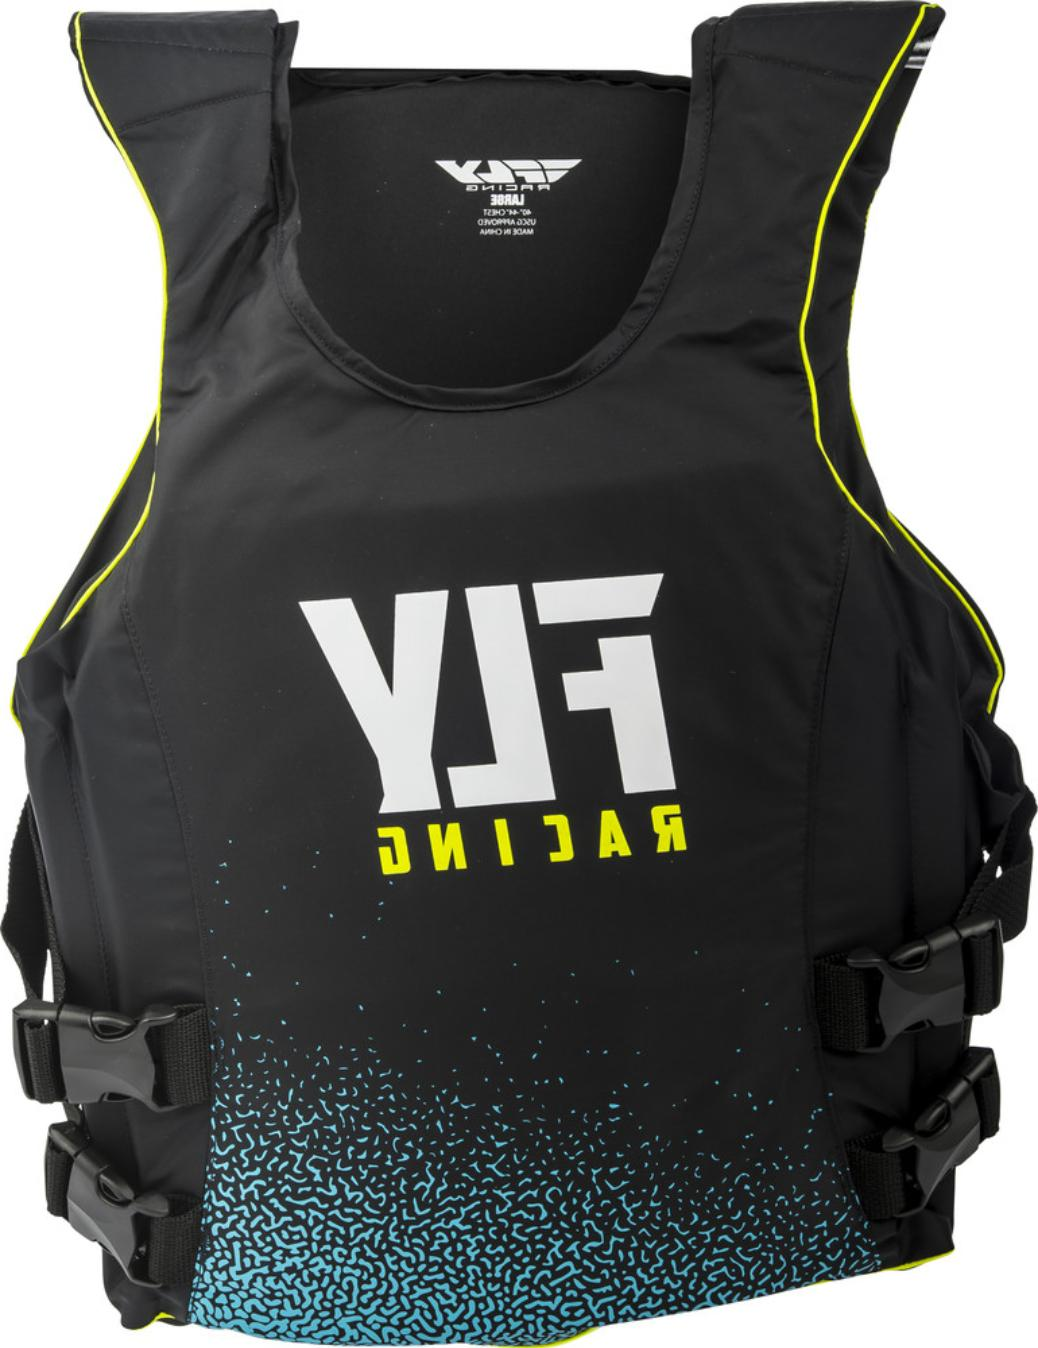 pull over nylon safety vest life jacket